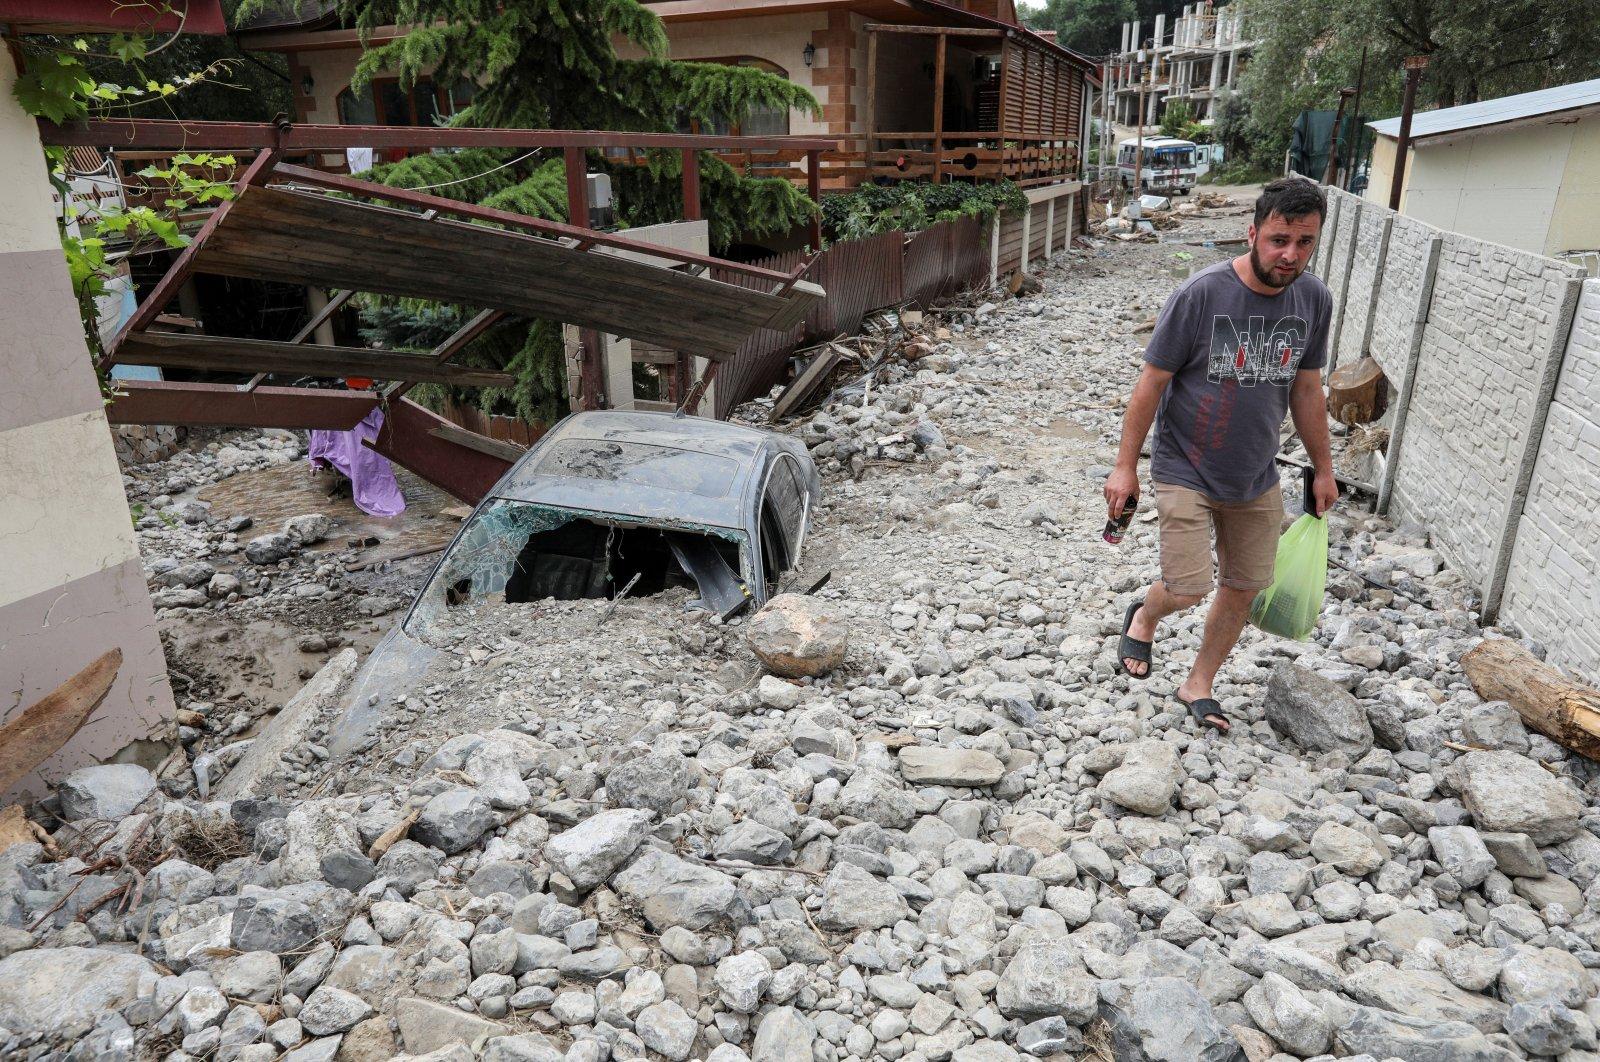 A man walks along a damaged street after heavy rainfall and floods in Yalta, Crimea, June 22, 2021. (Reuters Photo)